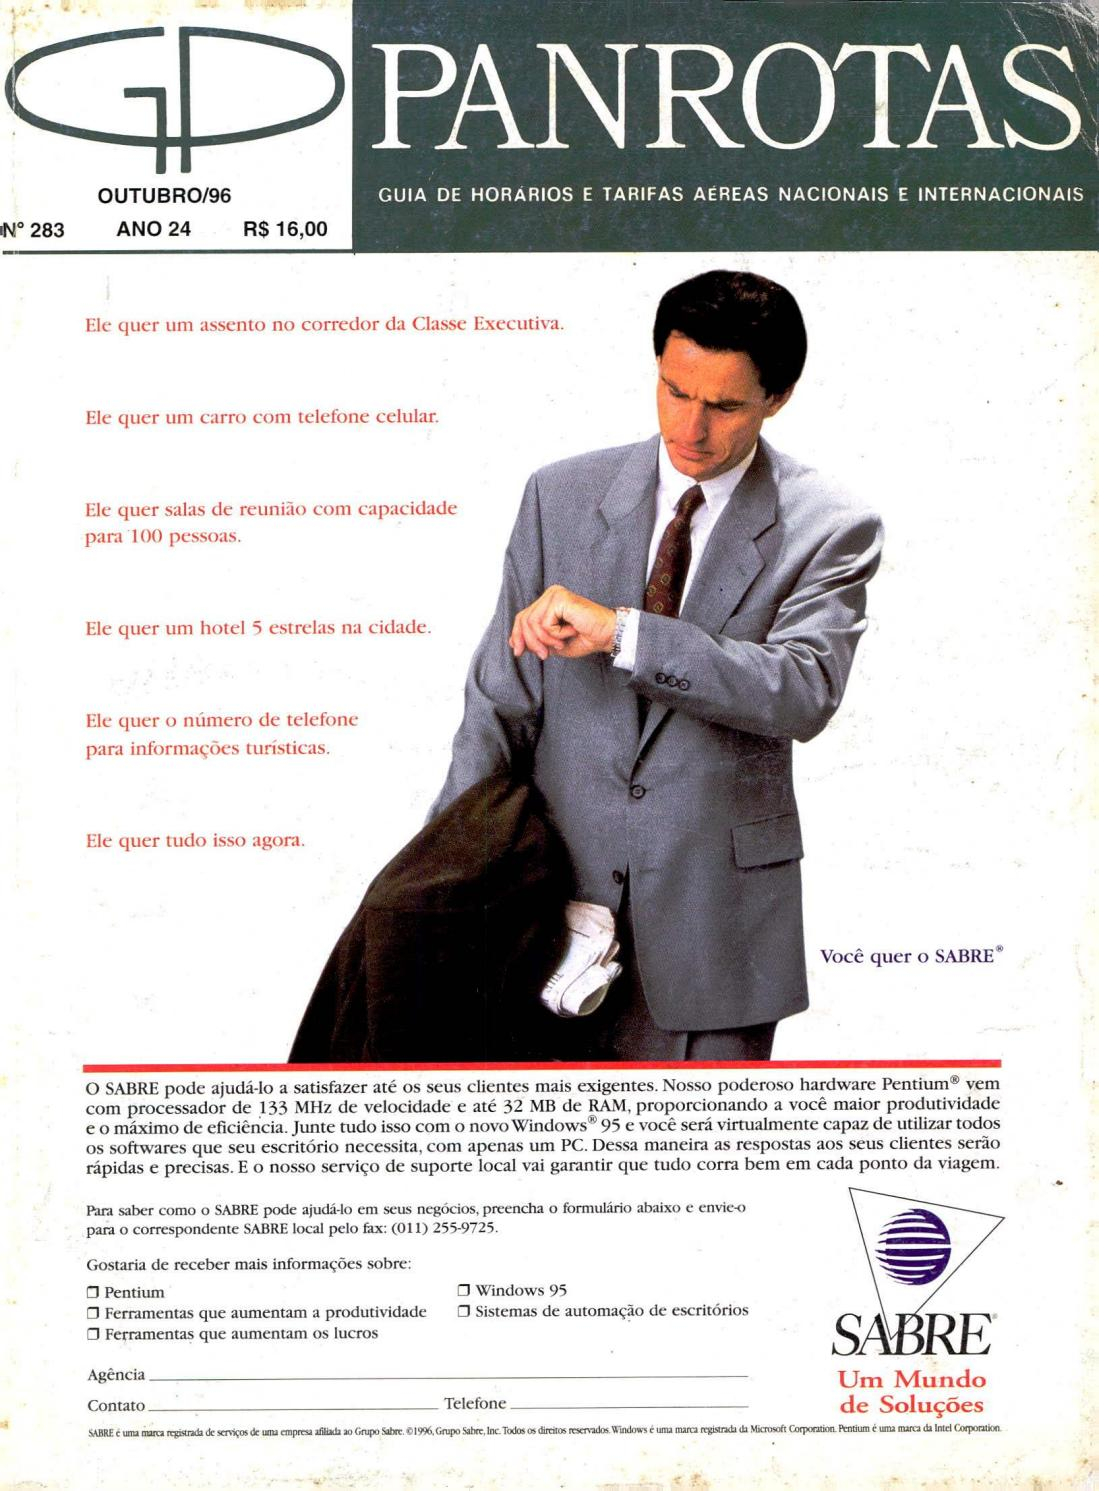 6812d3bf3 Guia PANROTAS - Edição 283 - Outubro/1996 by PANROTAS Editora - issuu